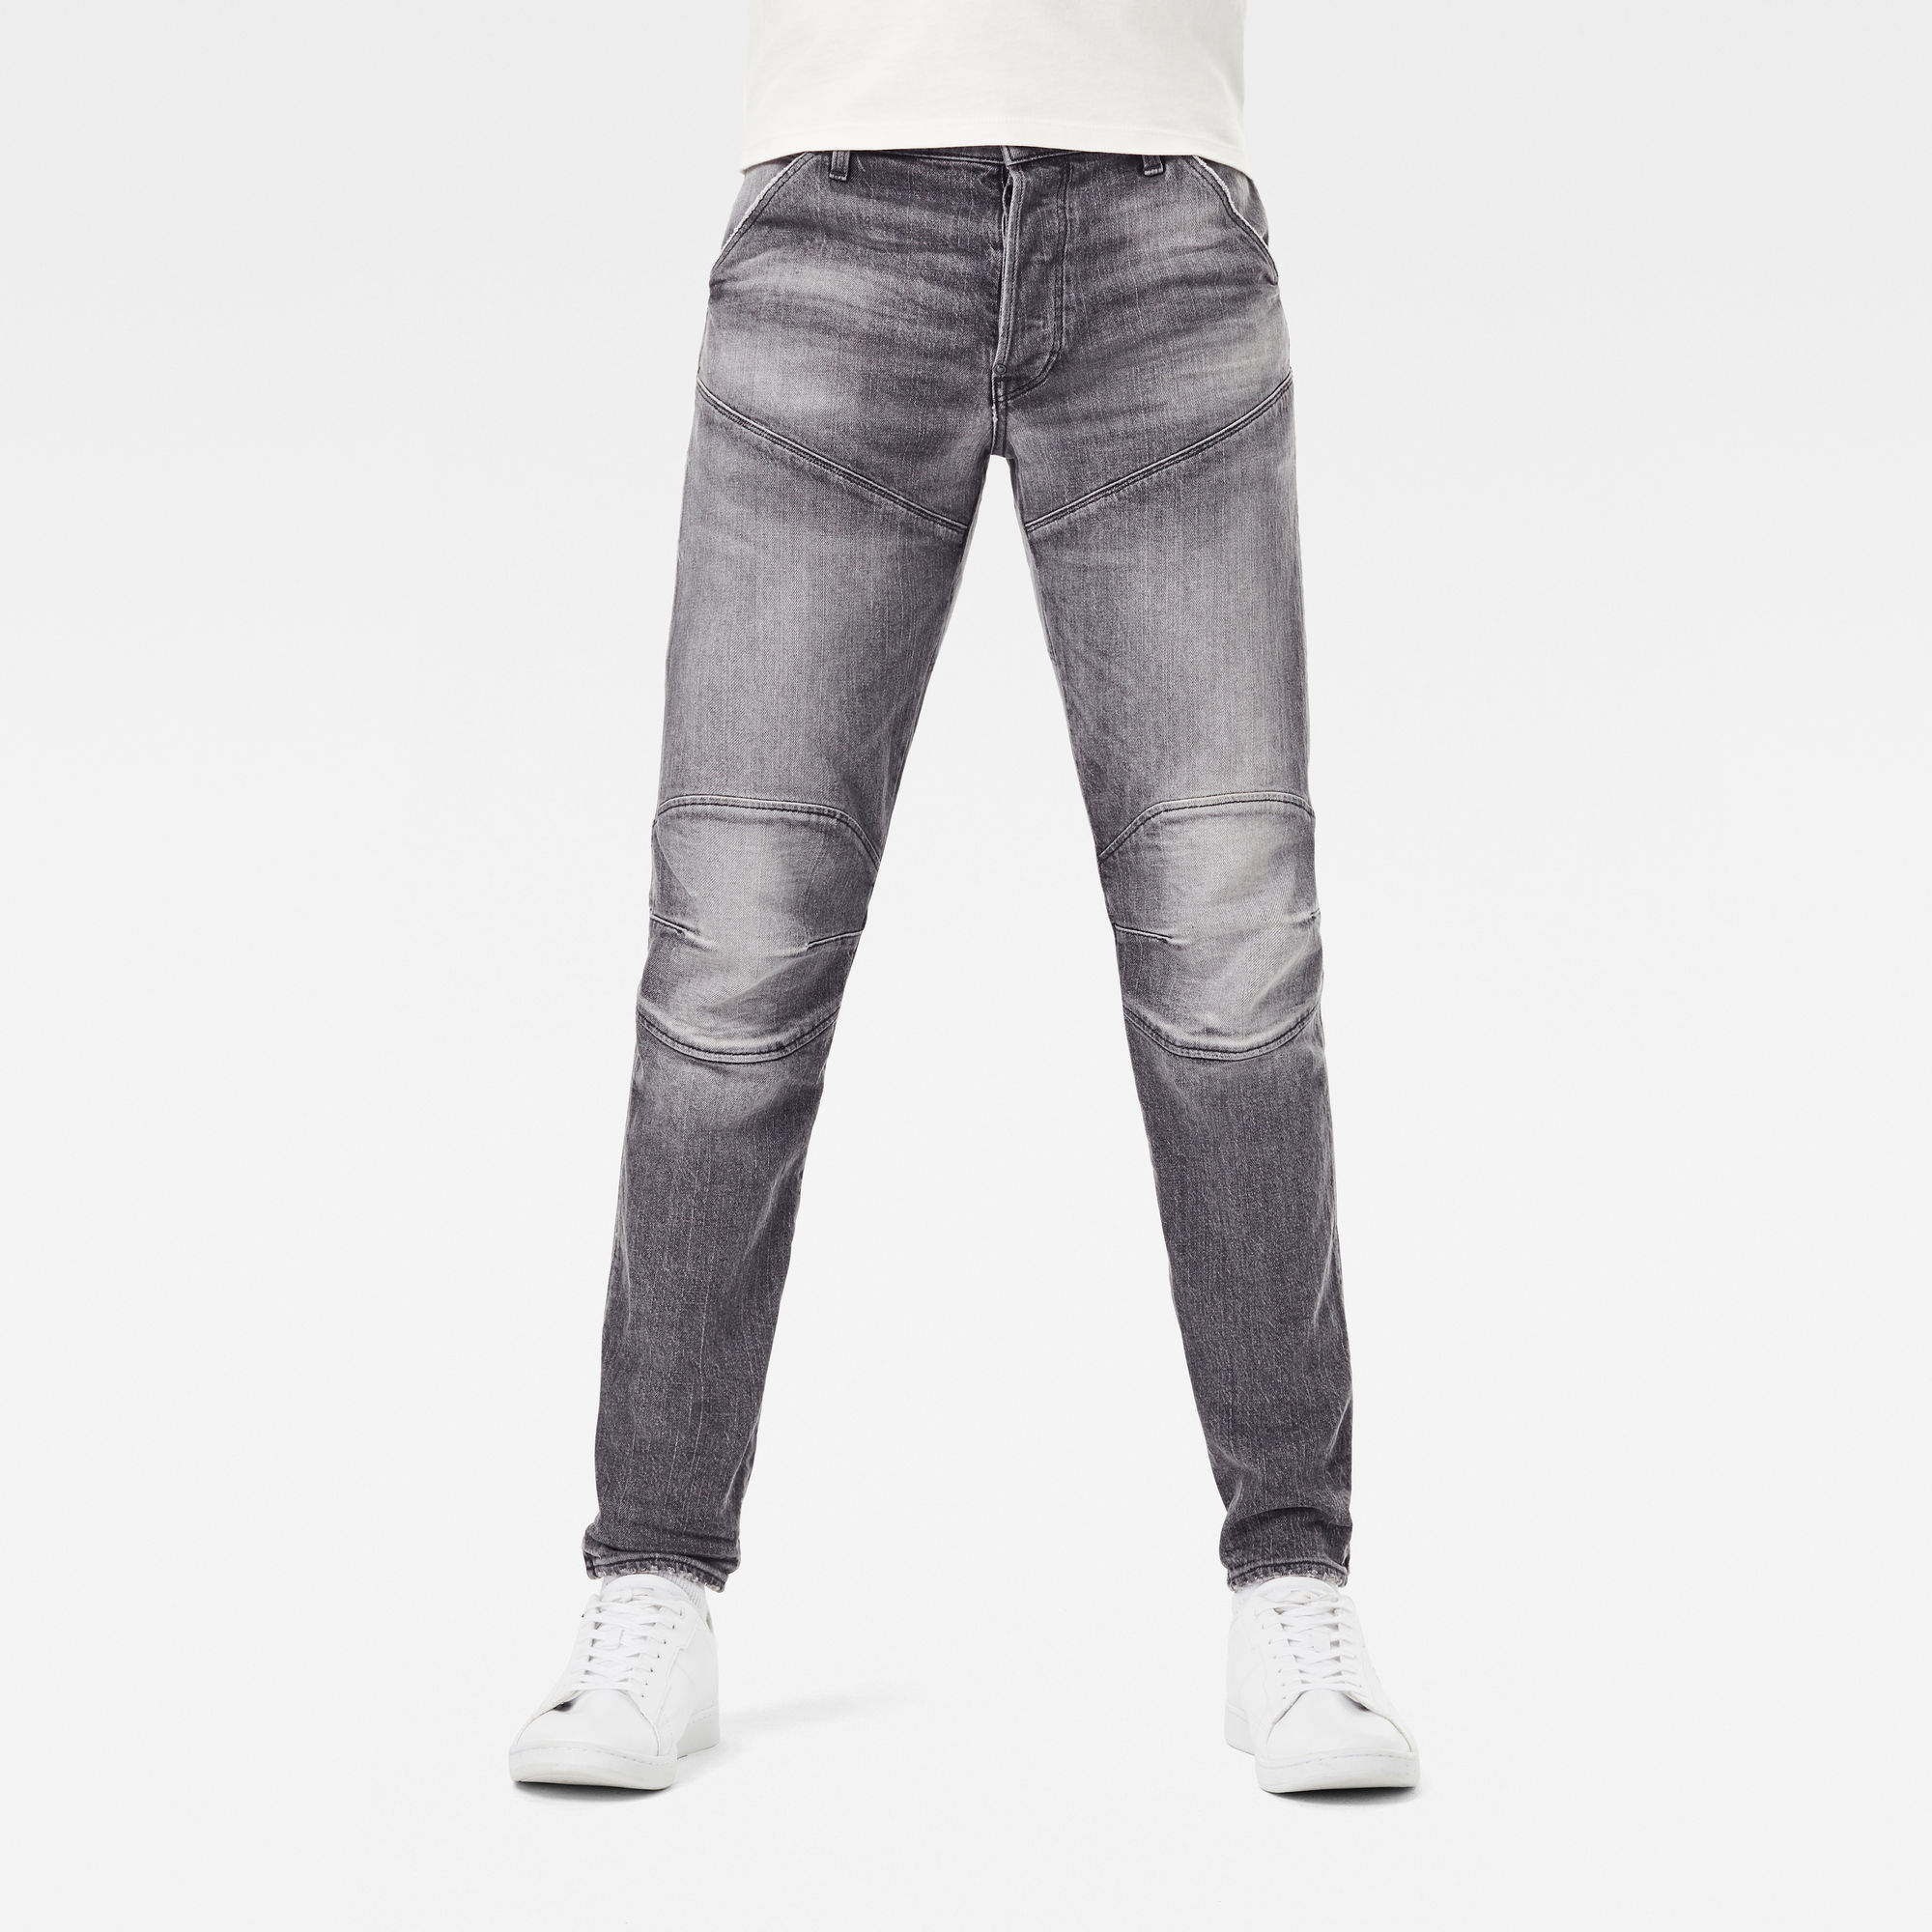 G-Star RAW Heren 5620 3D Slim Jeans Grijs